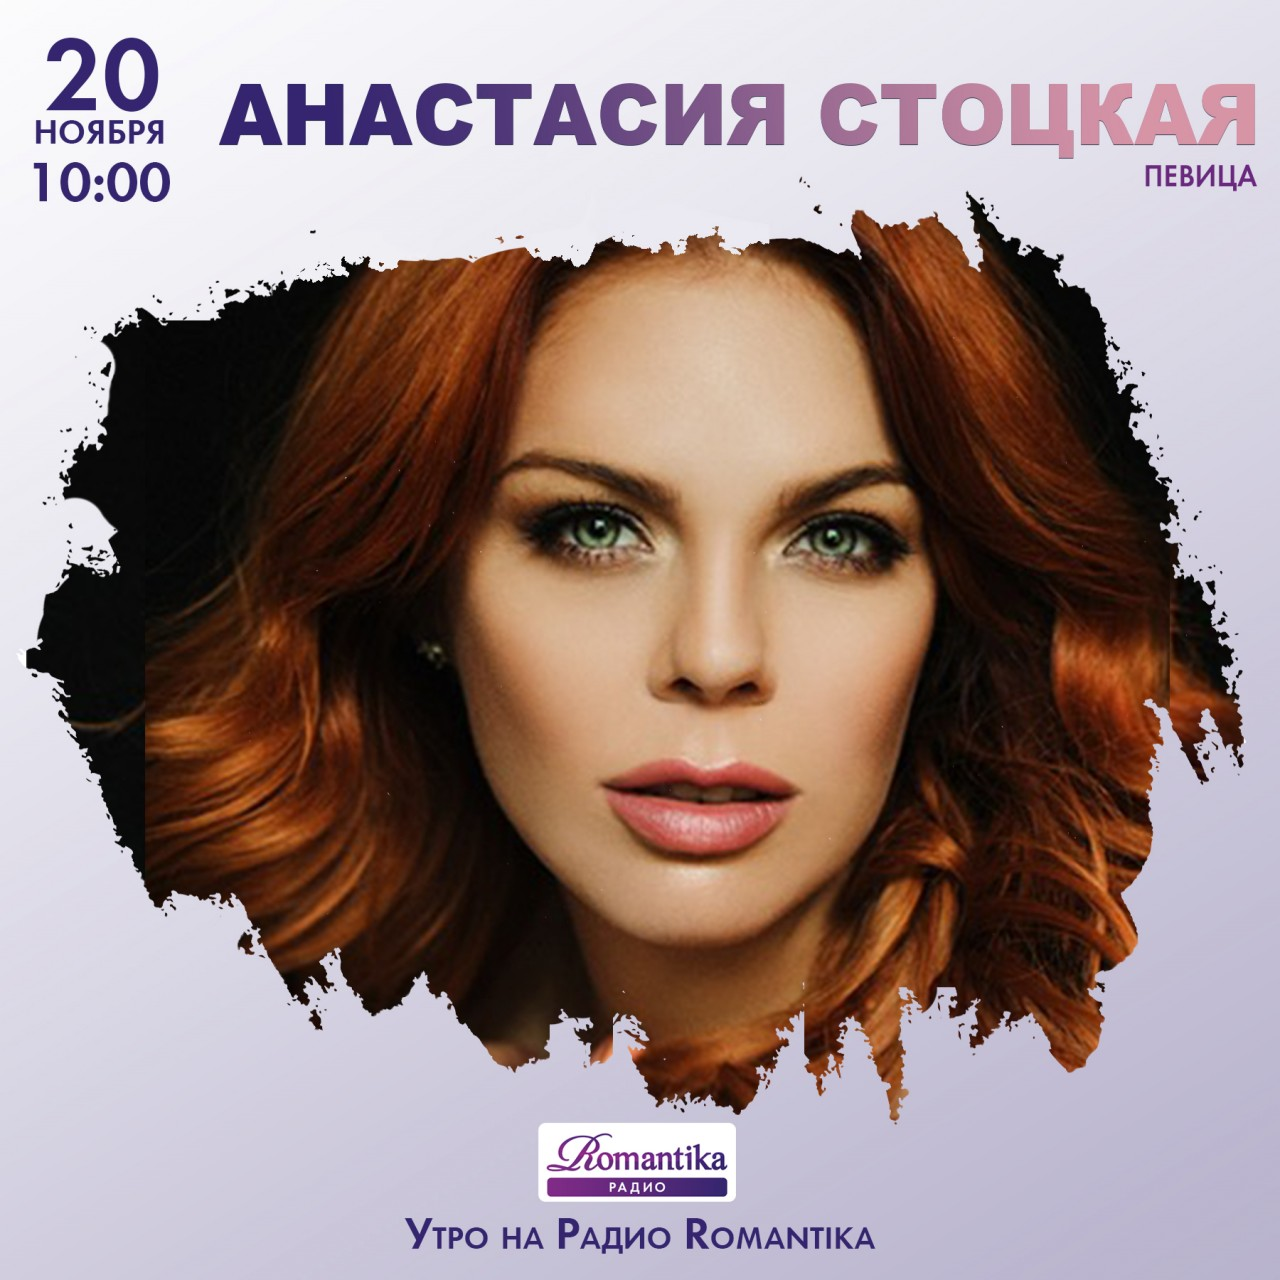 Радио Romantika: 20 ноября -…